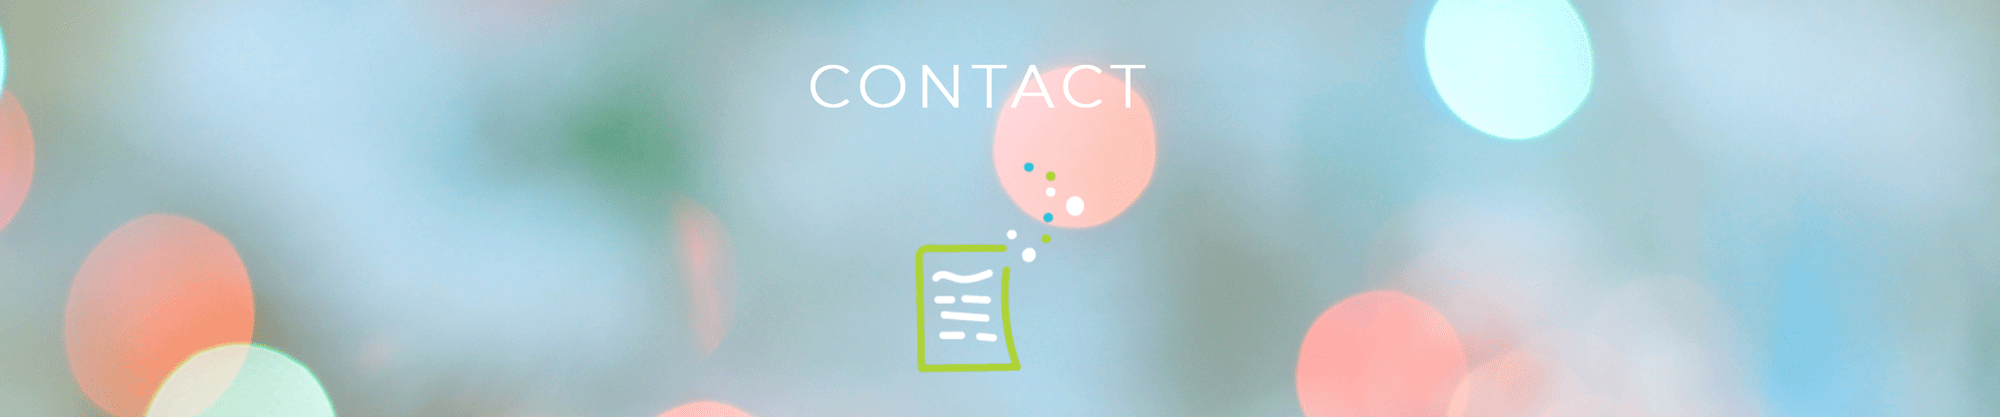 Contact, Intuisens, Ghislaine Bouesnard